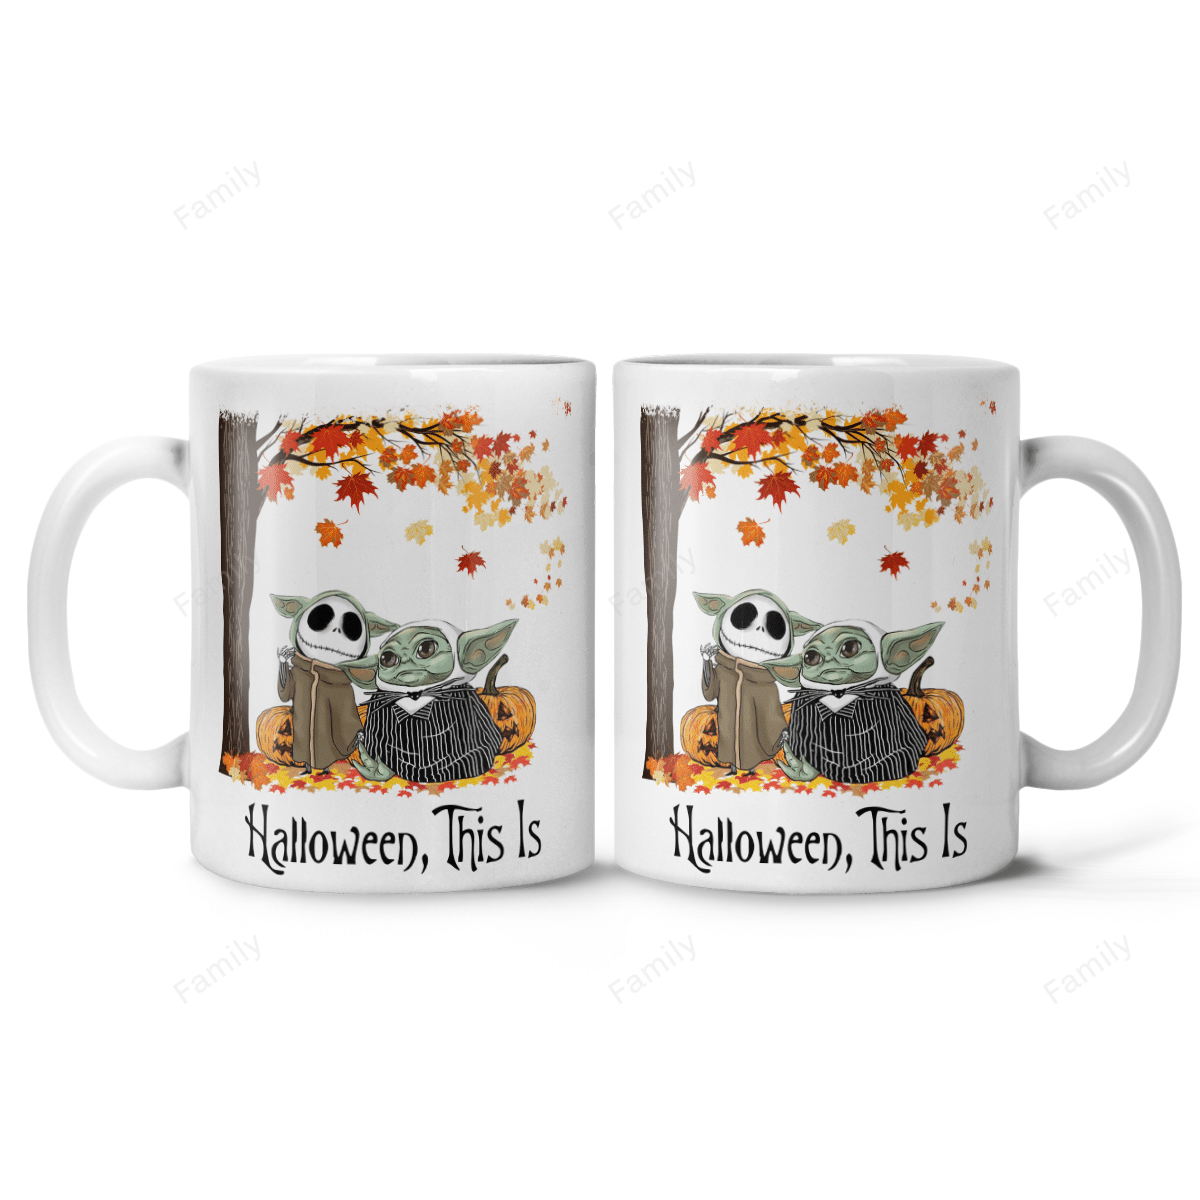 Halloween This Is Yoda Skellington Couple Mug